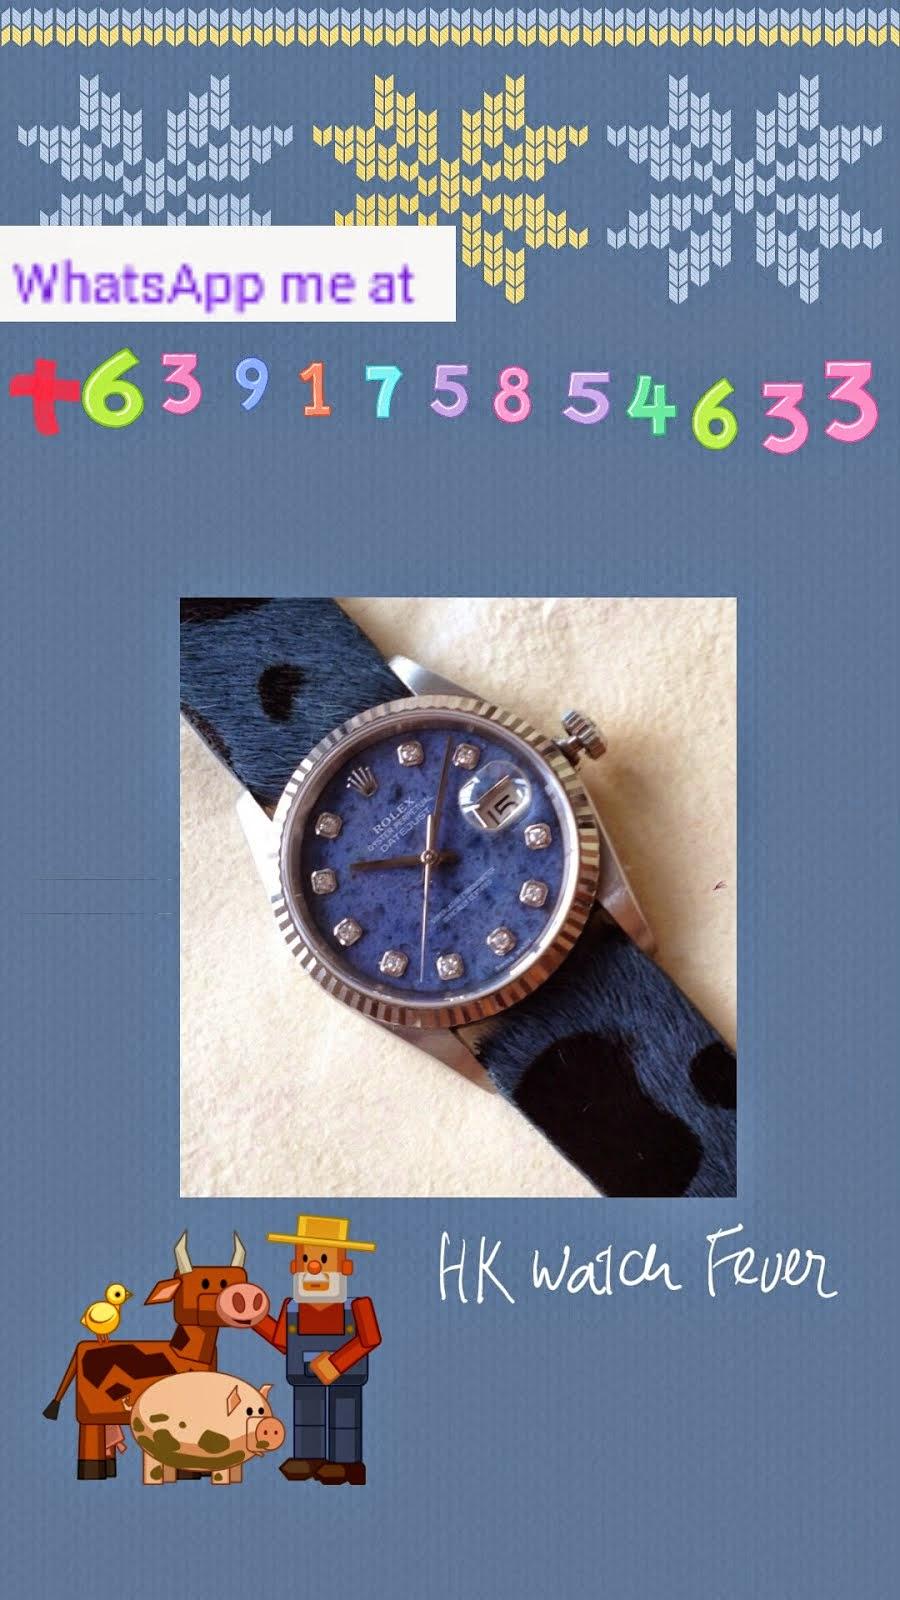 HK Snob Watch Fever's Contact